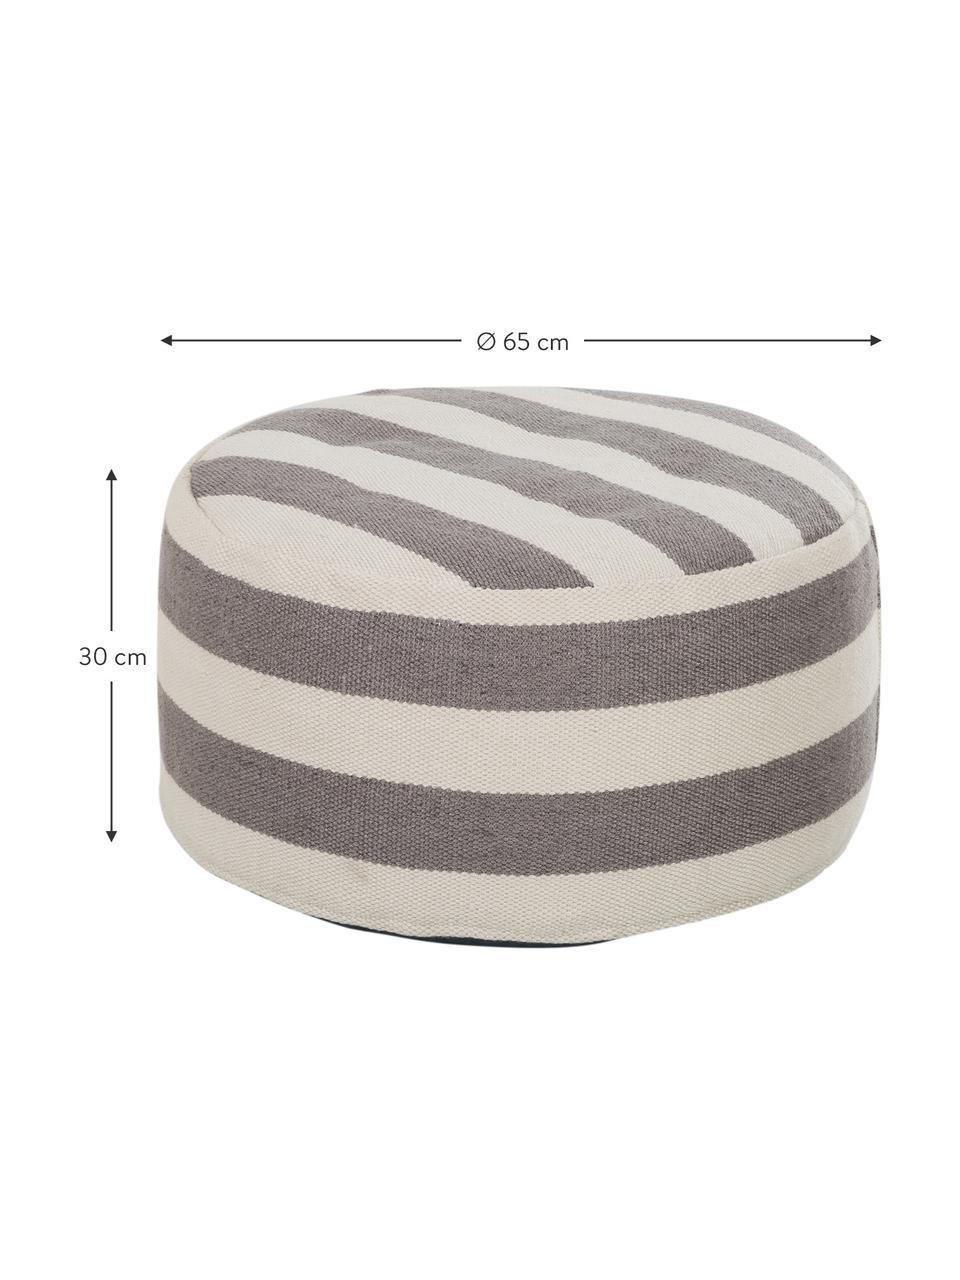 Runder In- und Outdoor-Pouf Lani, Bezug: Polyester, recycelt Füllu, Grau, Ecru, ∅ 65 x H 30 cm